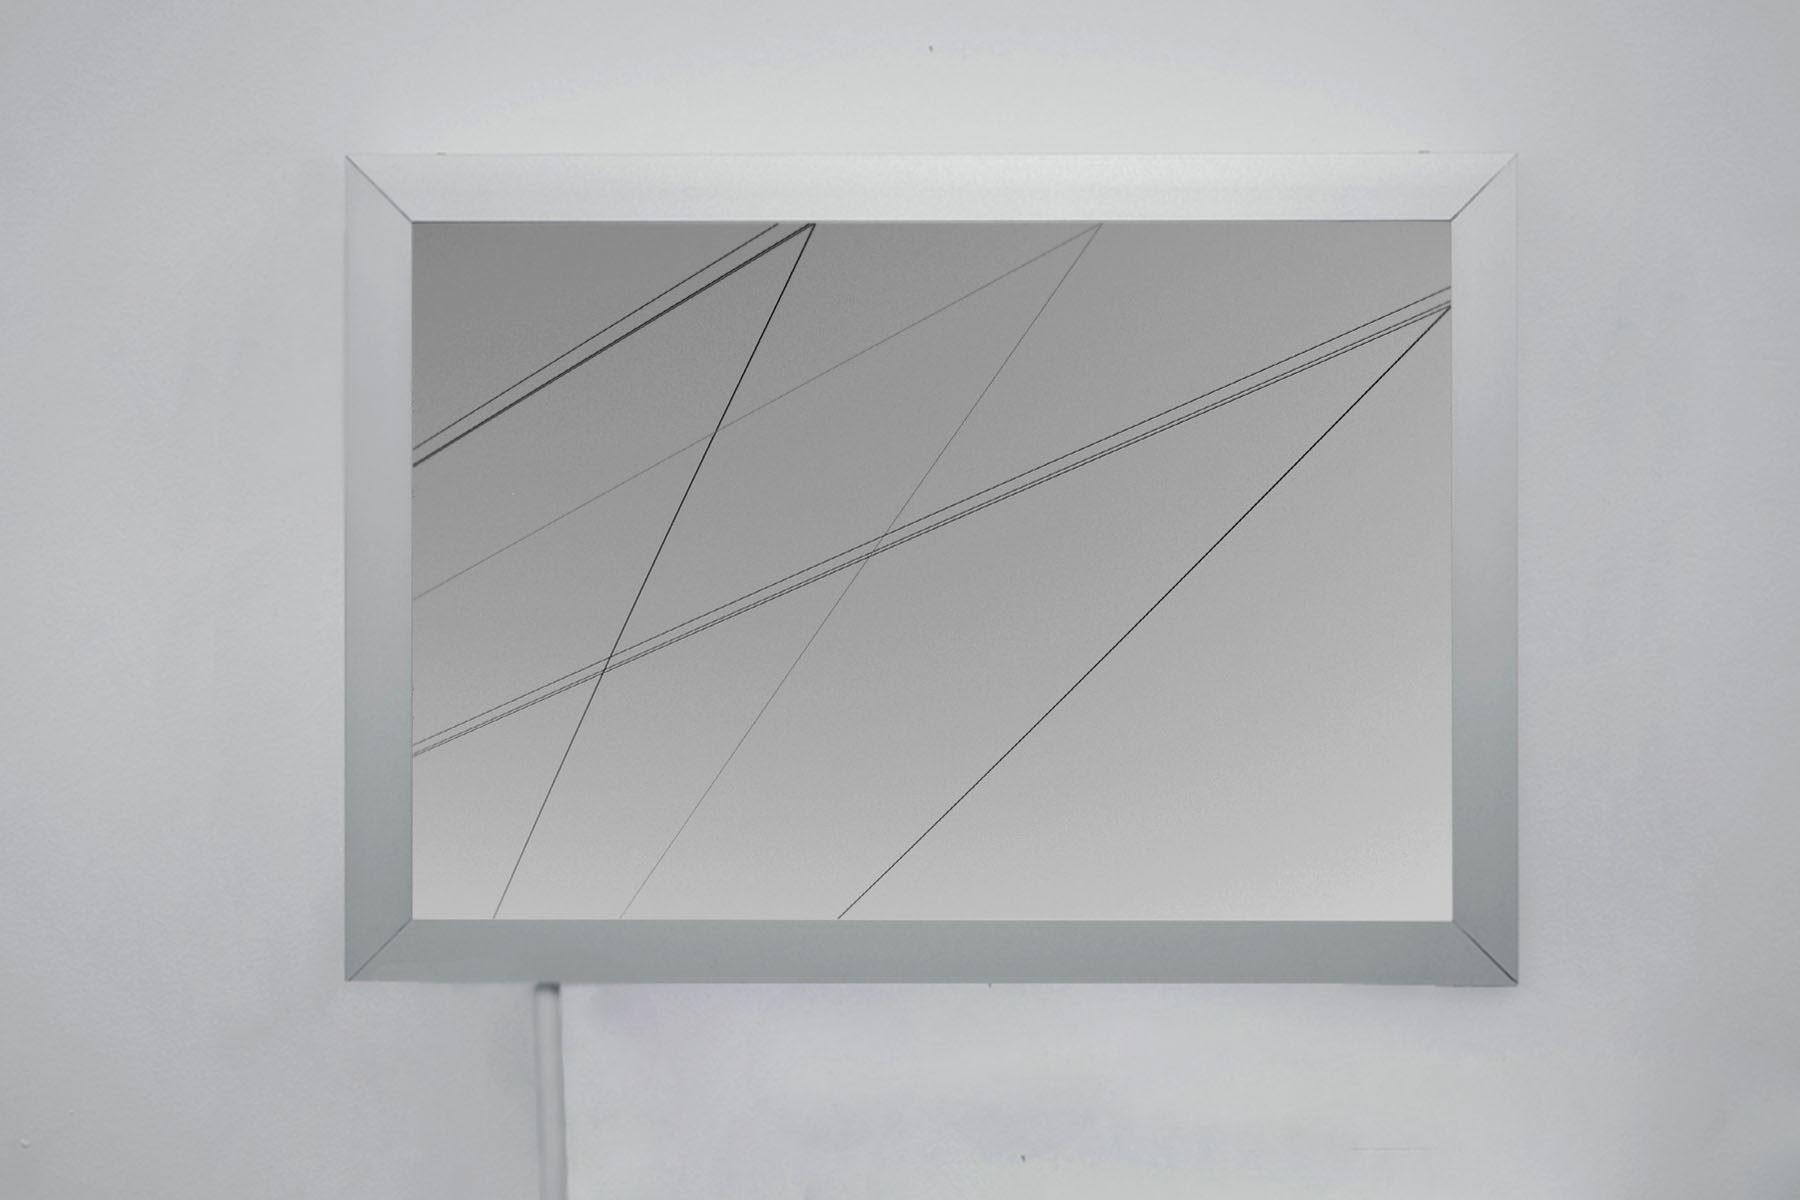 Michele Spanghero, Translucide, 2009, lightbox